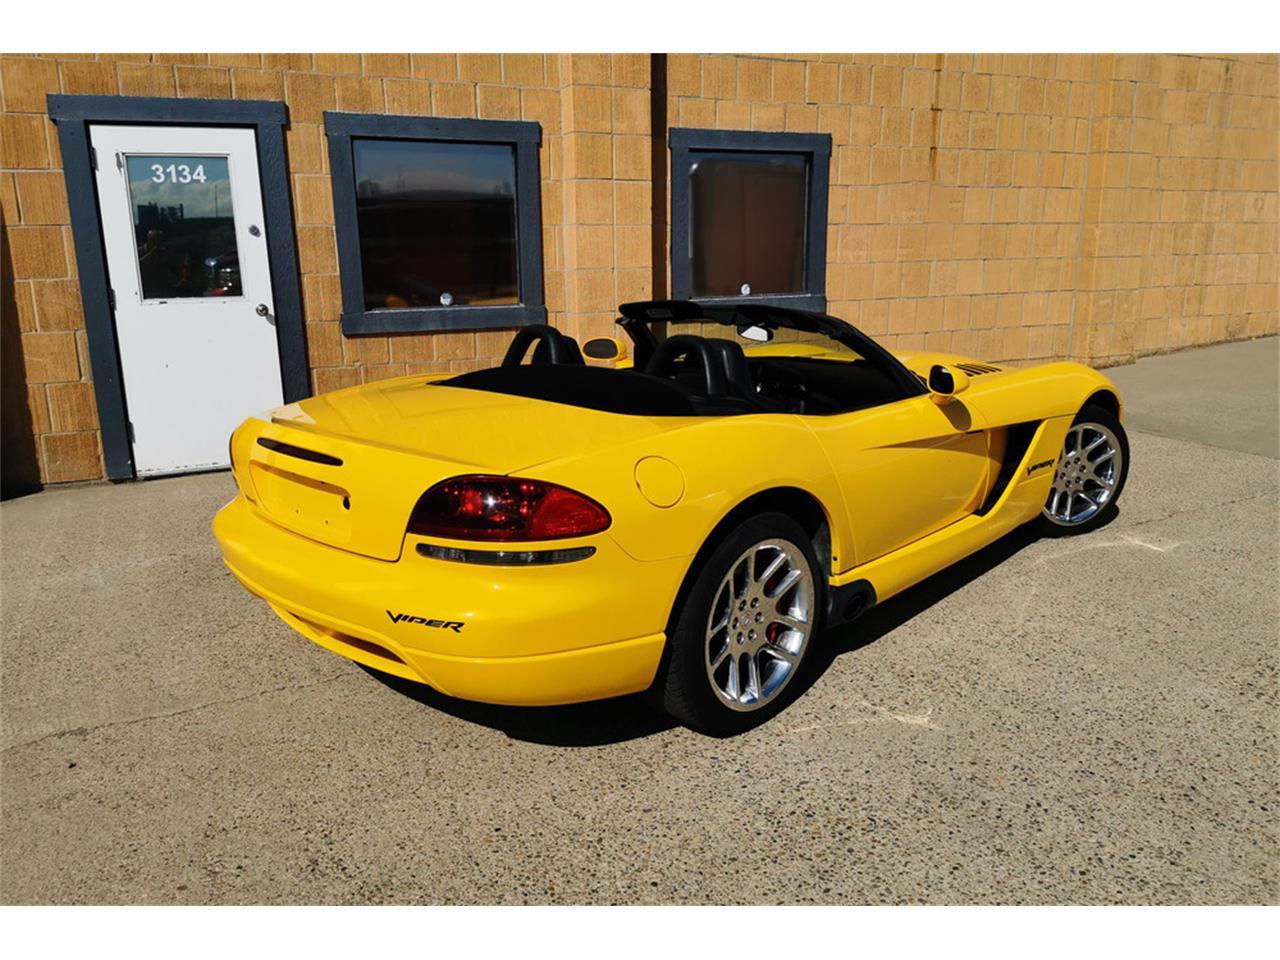 2005 Dodge Viper (CC-1301241) for sale in Scottsdale, Arizona